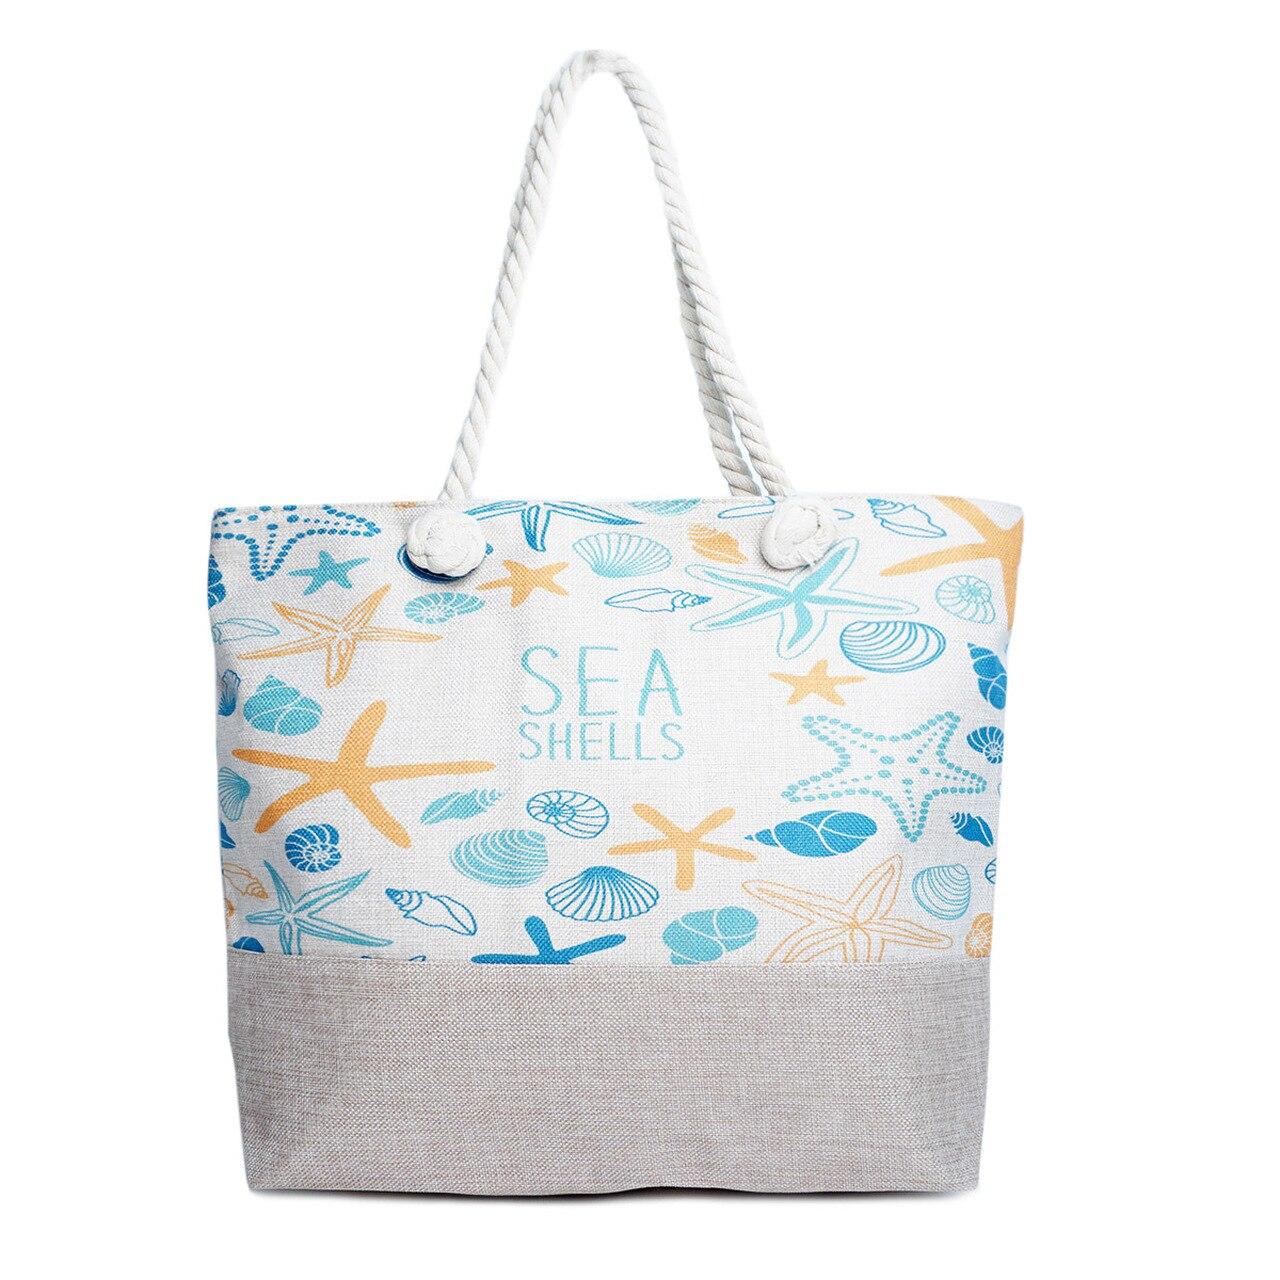 Sea Shells Tote Bag -Light Beige - Front